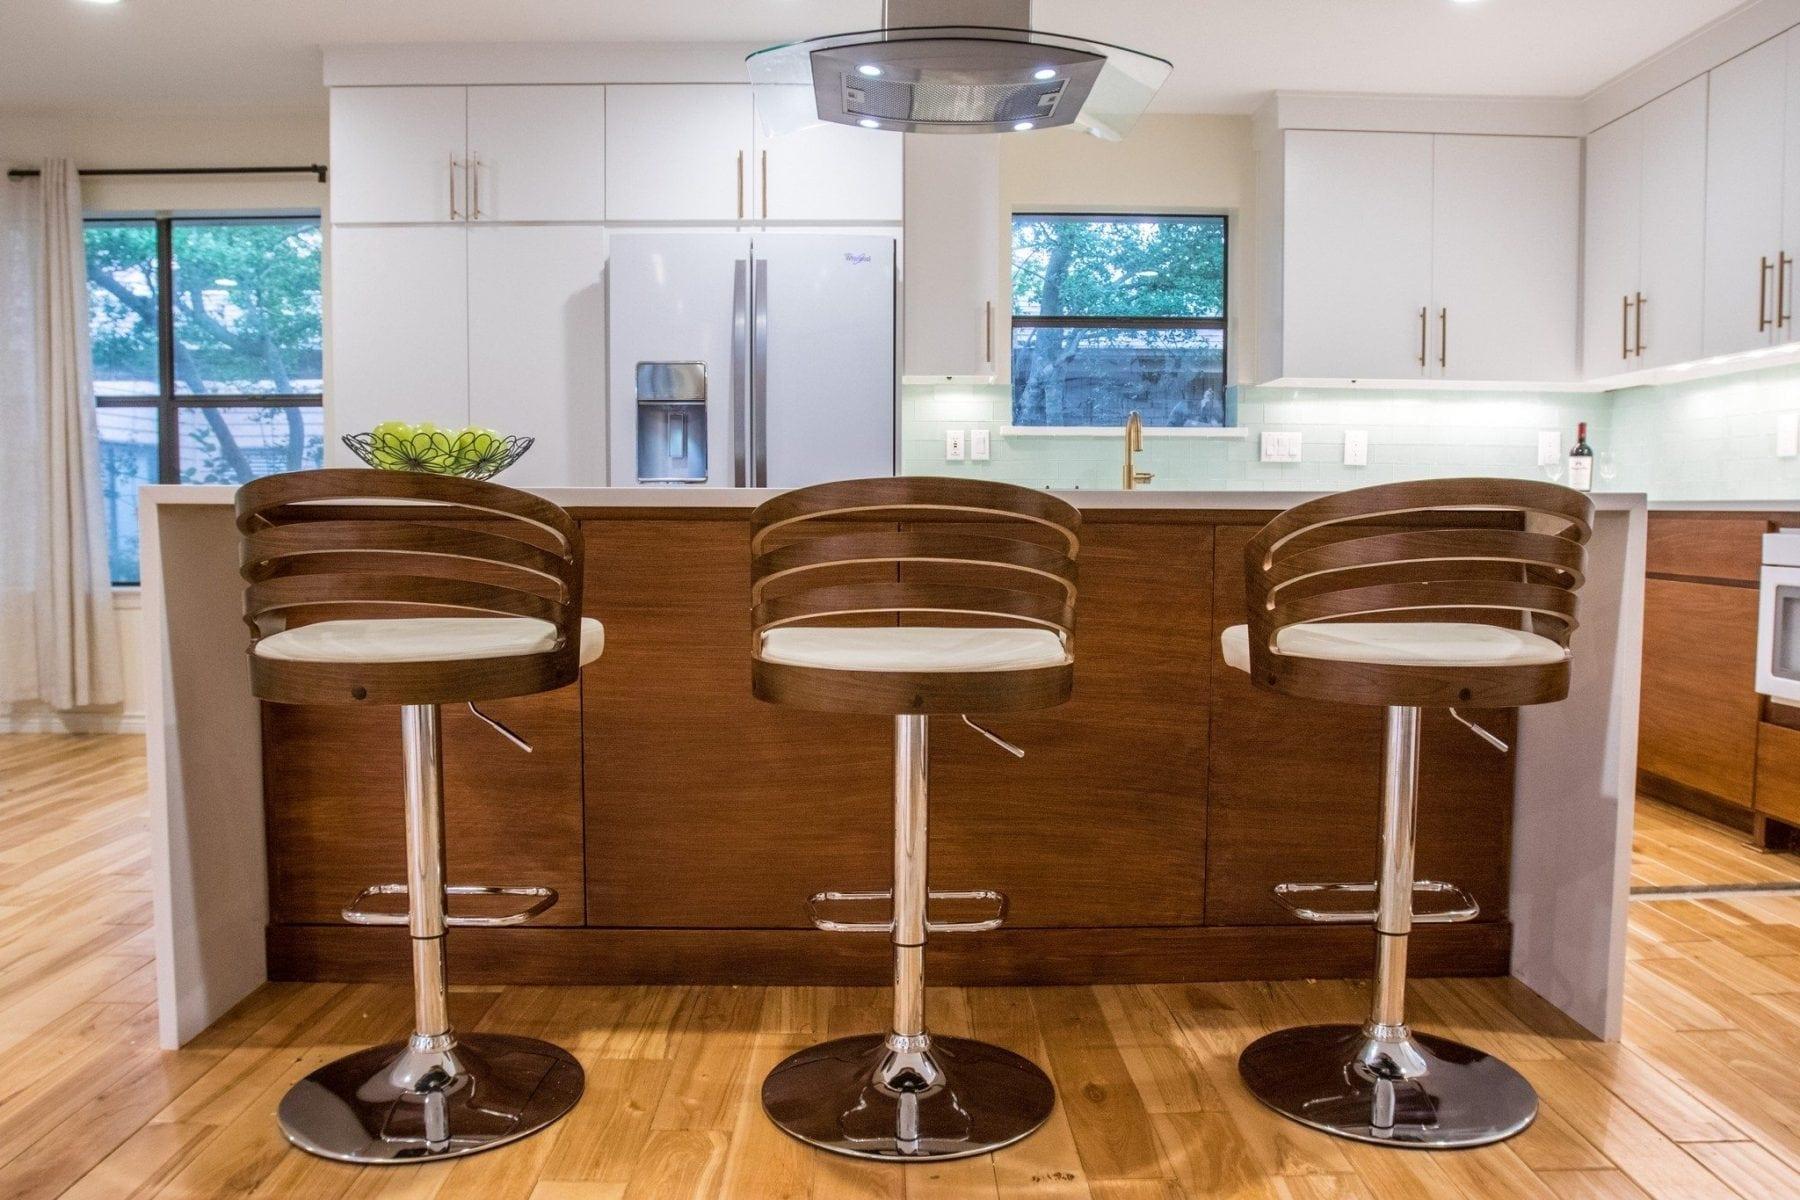 Prestonwood- Dallas-TX-75248-Kitchen-After-Remodeling-pics 03